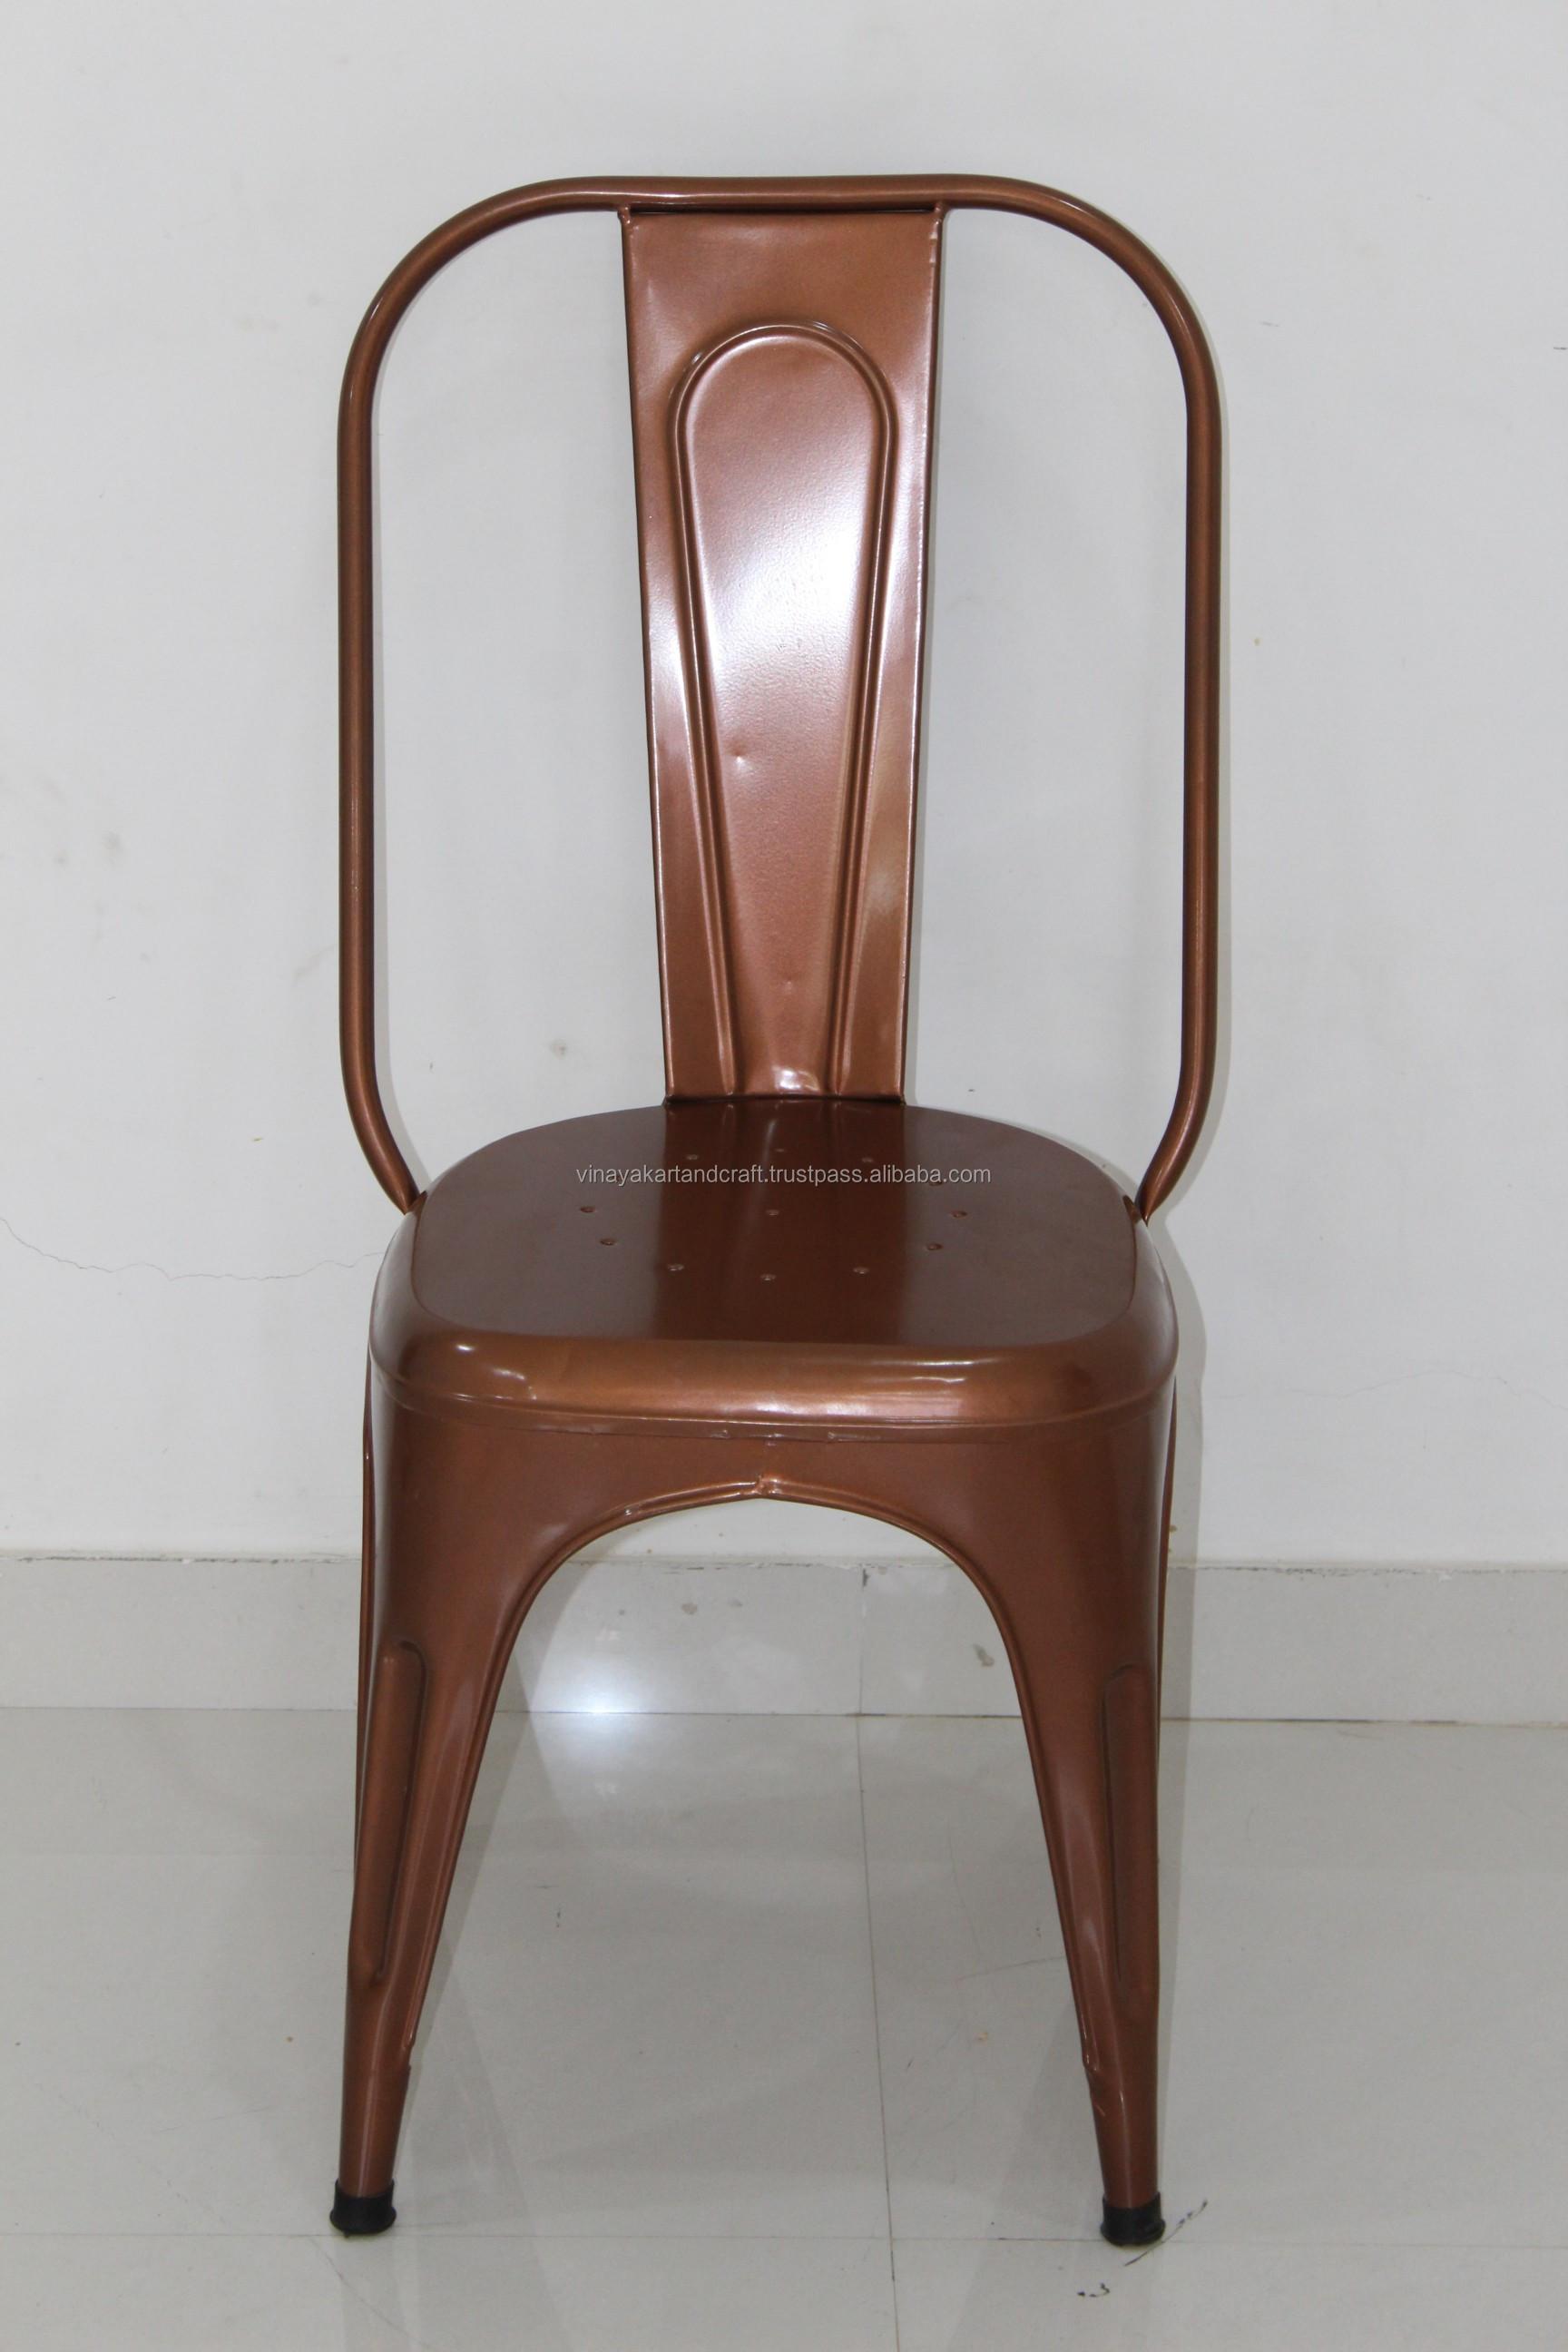 Sedie In Ferro Vintage.Vintage Metallo Industriale Pila Sedia In Metallo Sedia In Stile